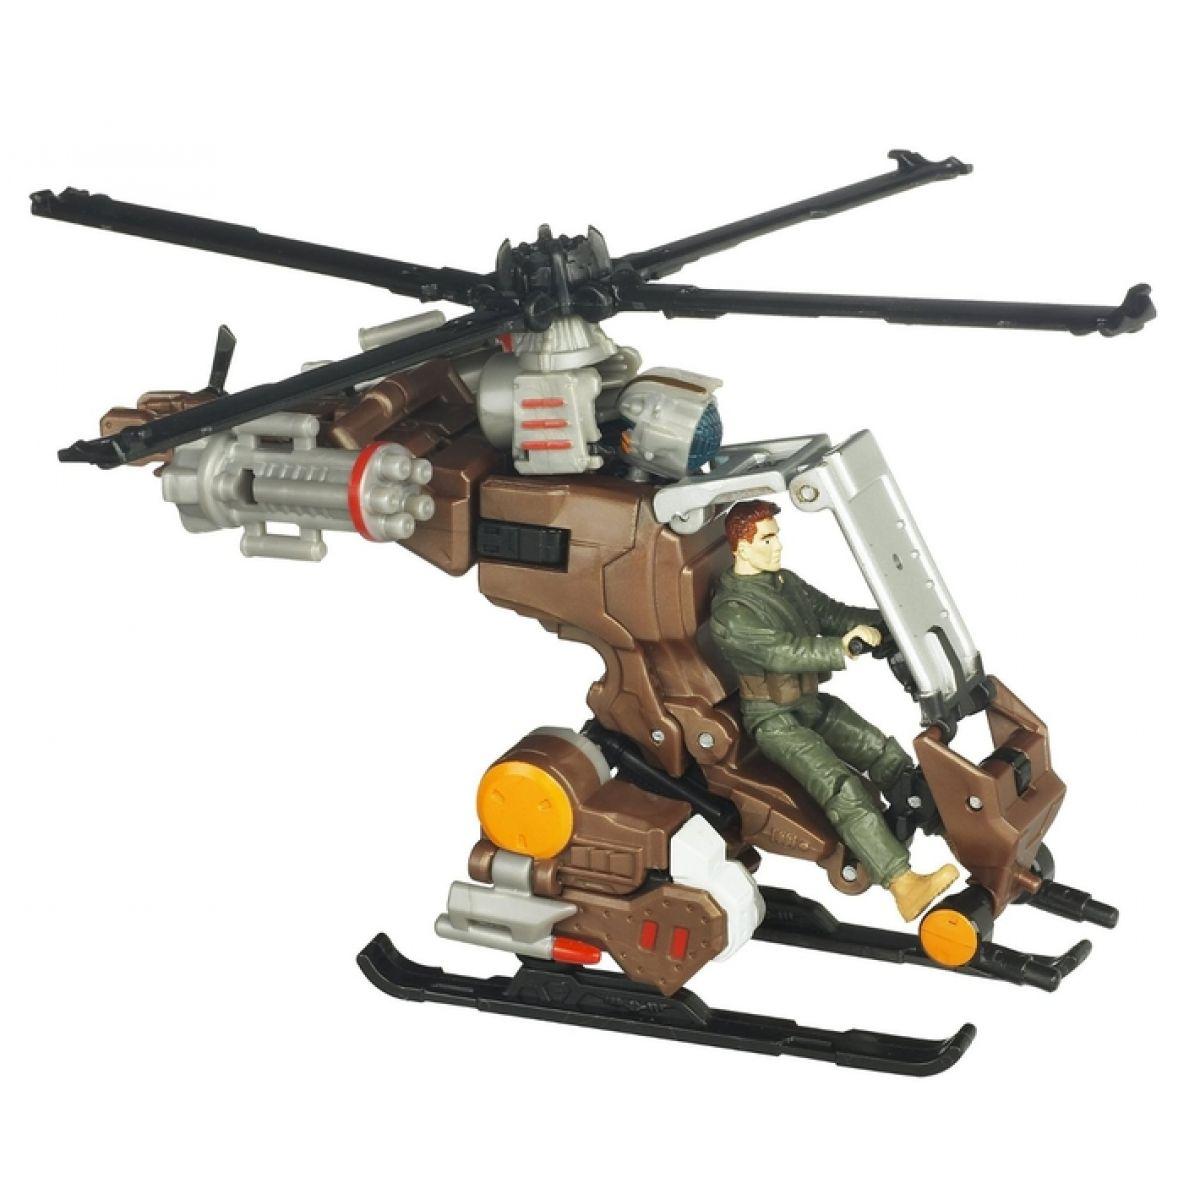 Transformers human alliance základní figurka Hasbro 28752 - Major Sparkplug a Whirl